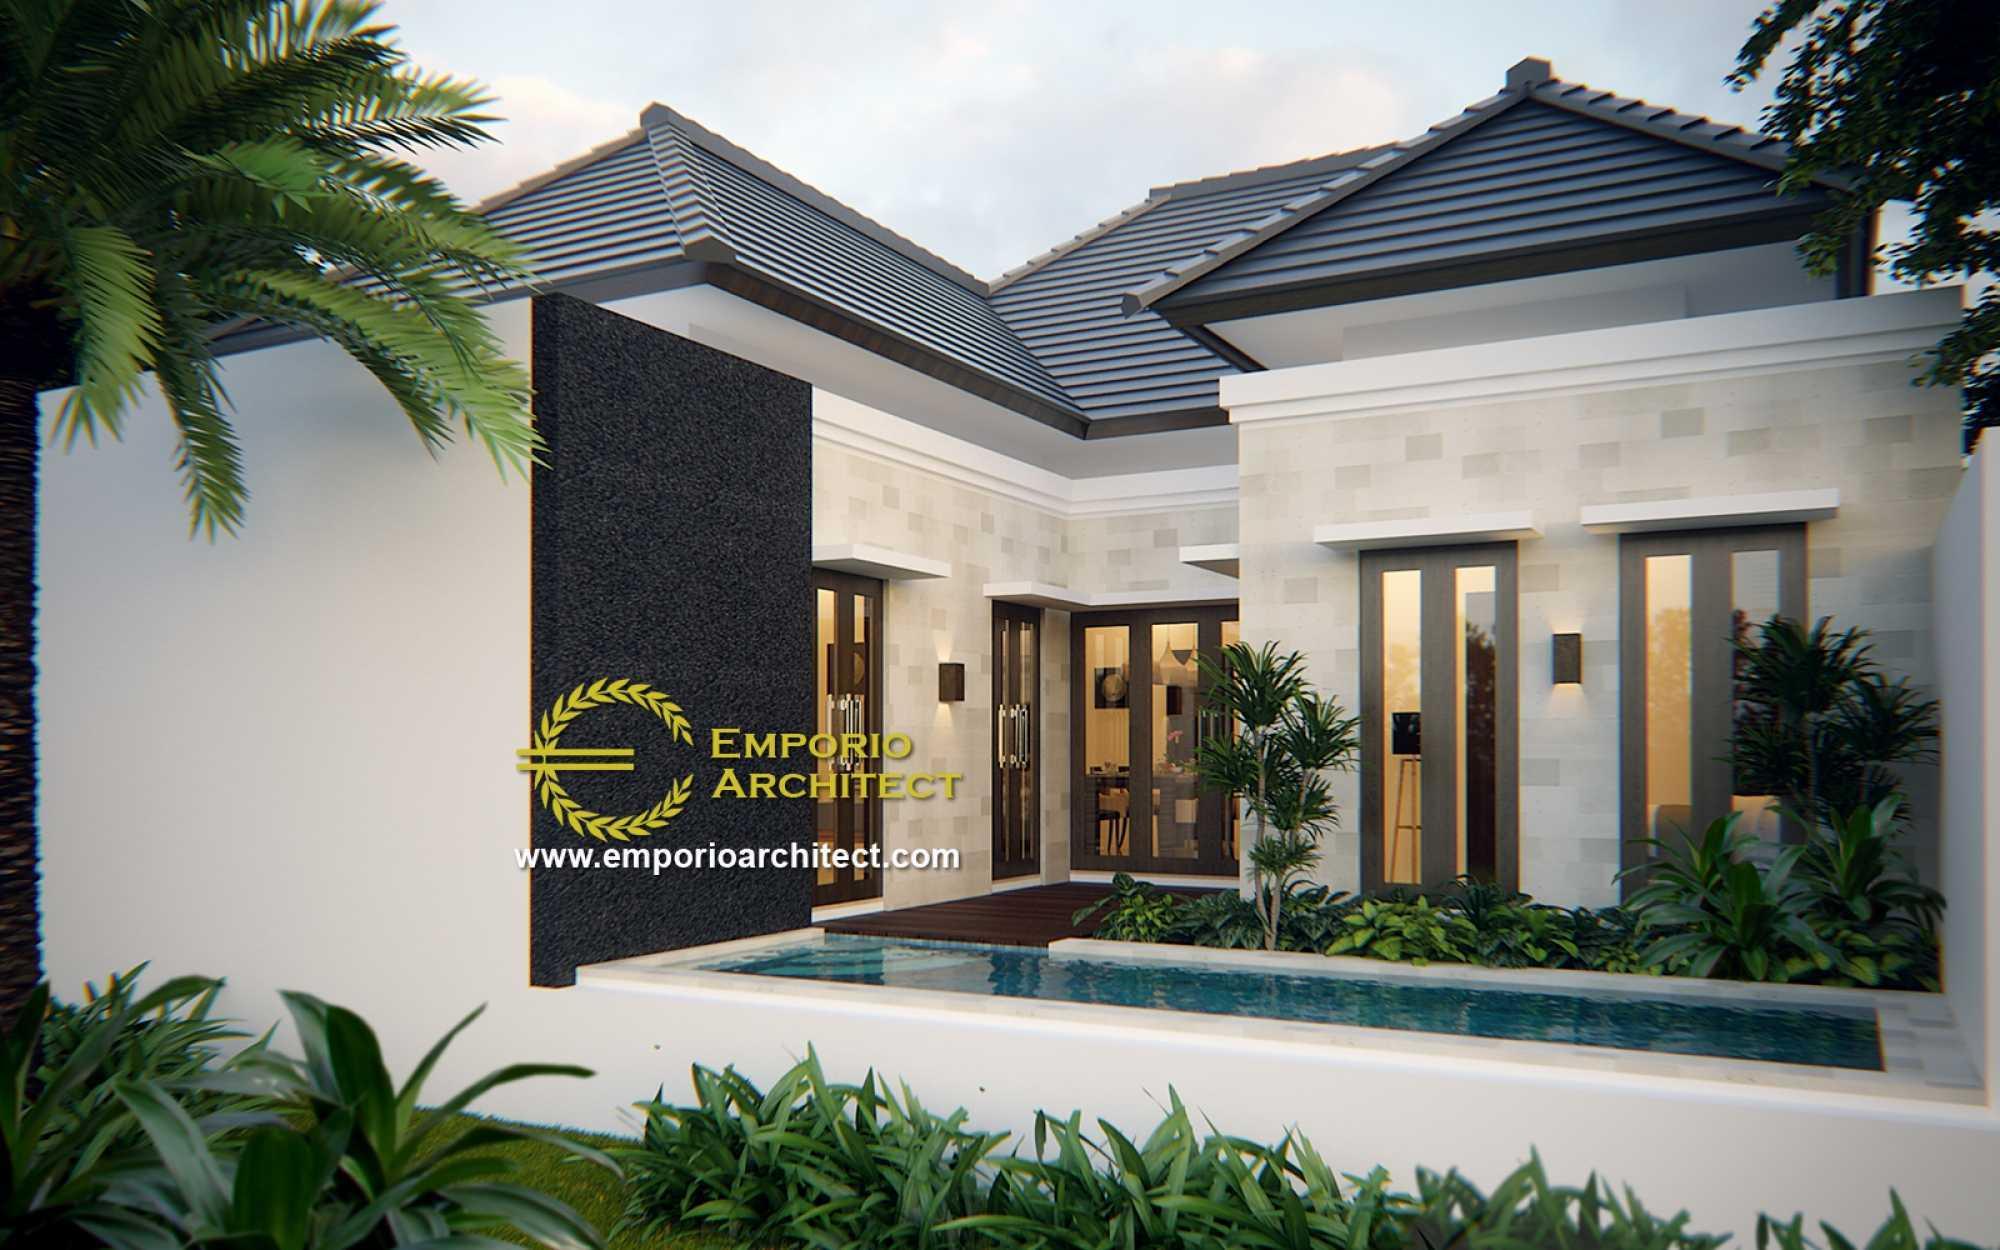 Emporio Architect Desain Rumah Villa Bali Tropis 351 @ Nusa Tenggara Barat Nusa Tenggara Bar., Indonesia Nusa Tenggara Bar., Indonesia Emporio-Architect-Desain-Rumah-Villa-Bali-Tropis-351-Nusa-Tenggara-Barat Tropical 75716